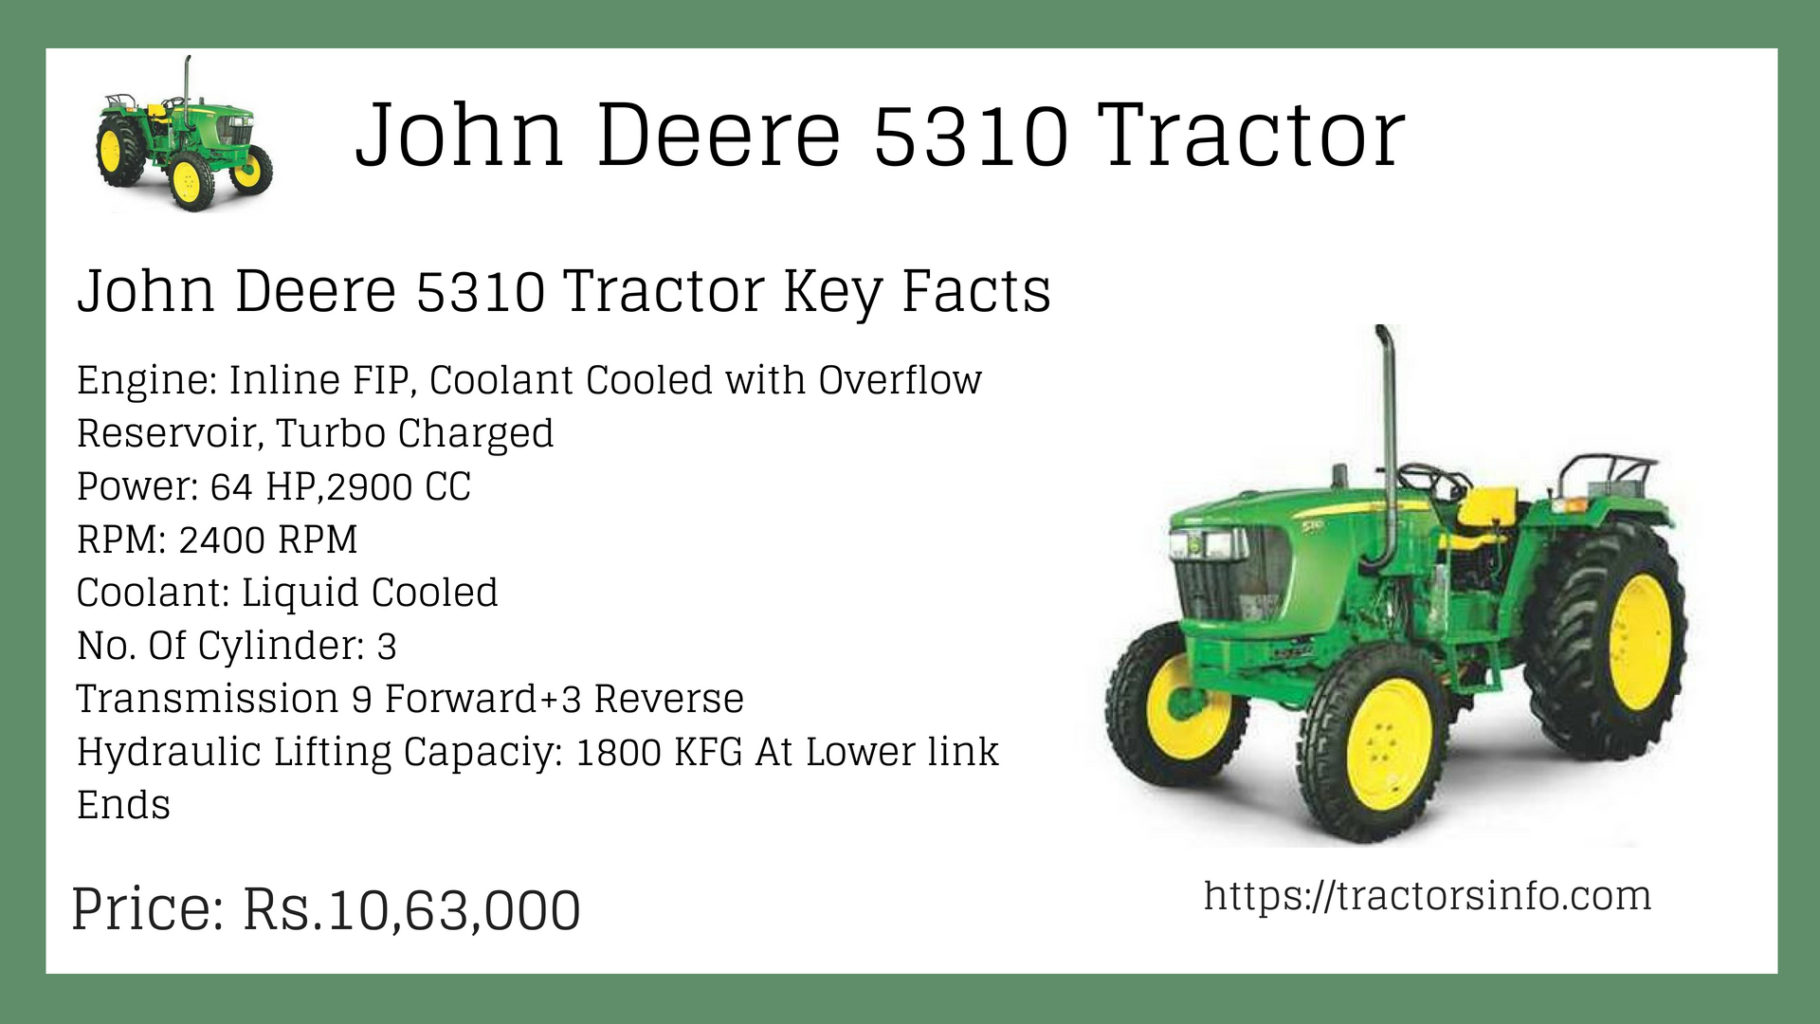 John deere 5310